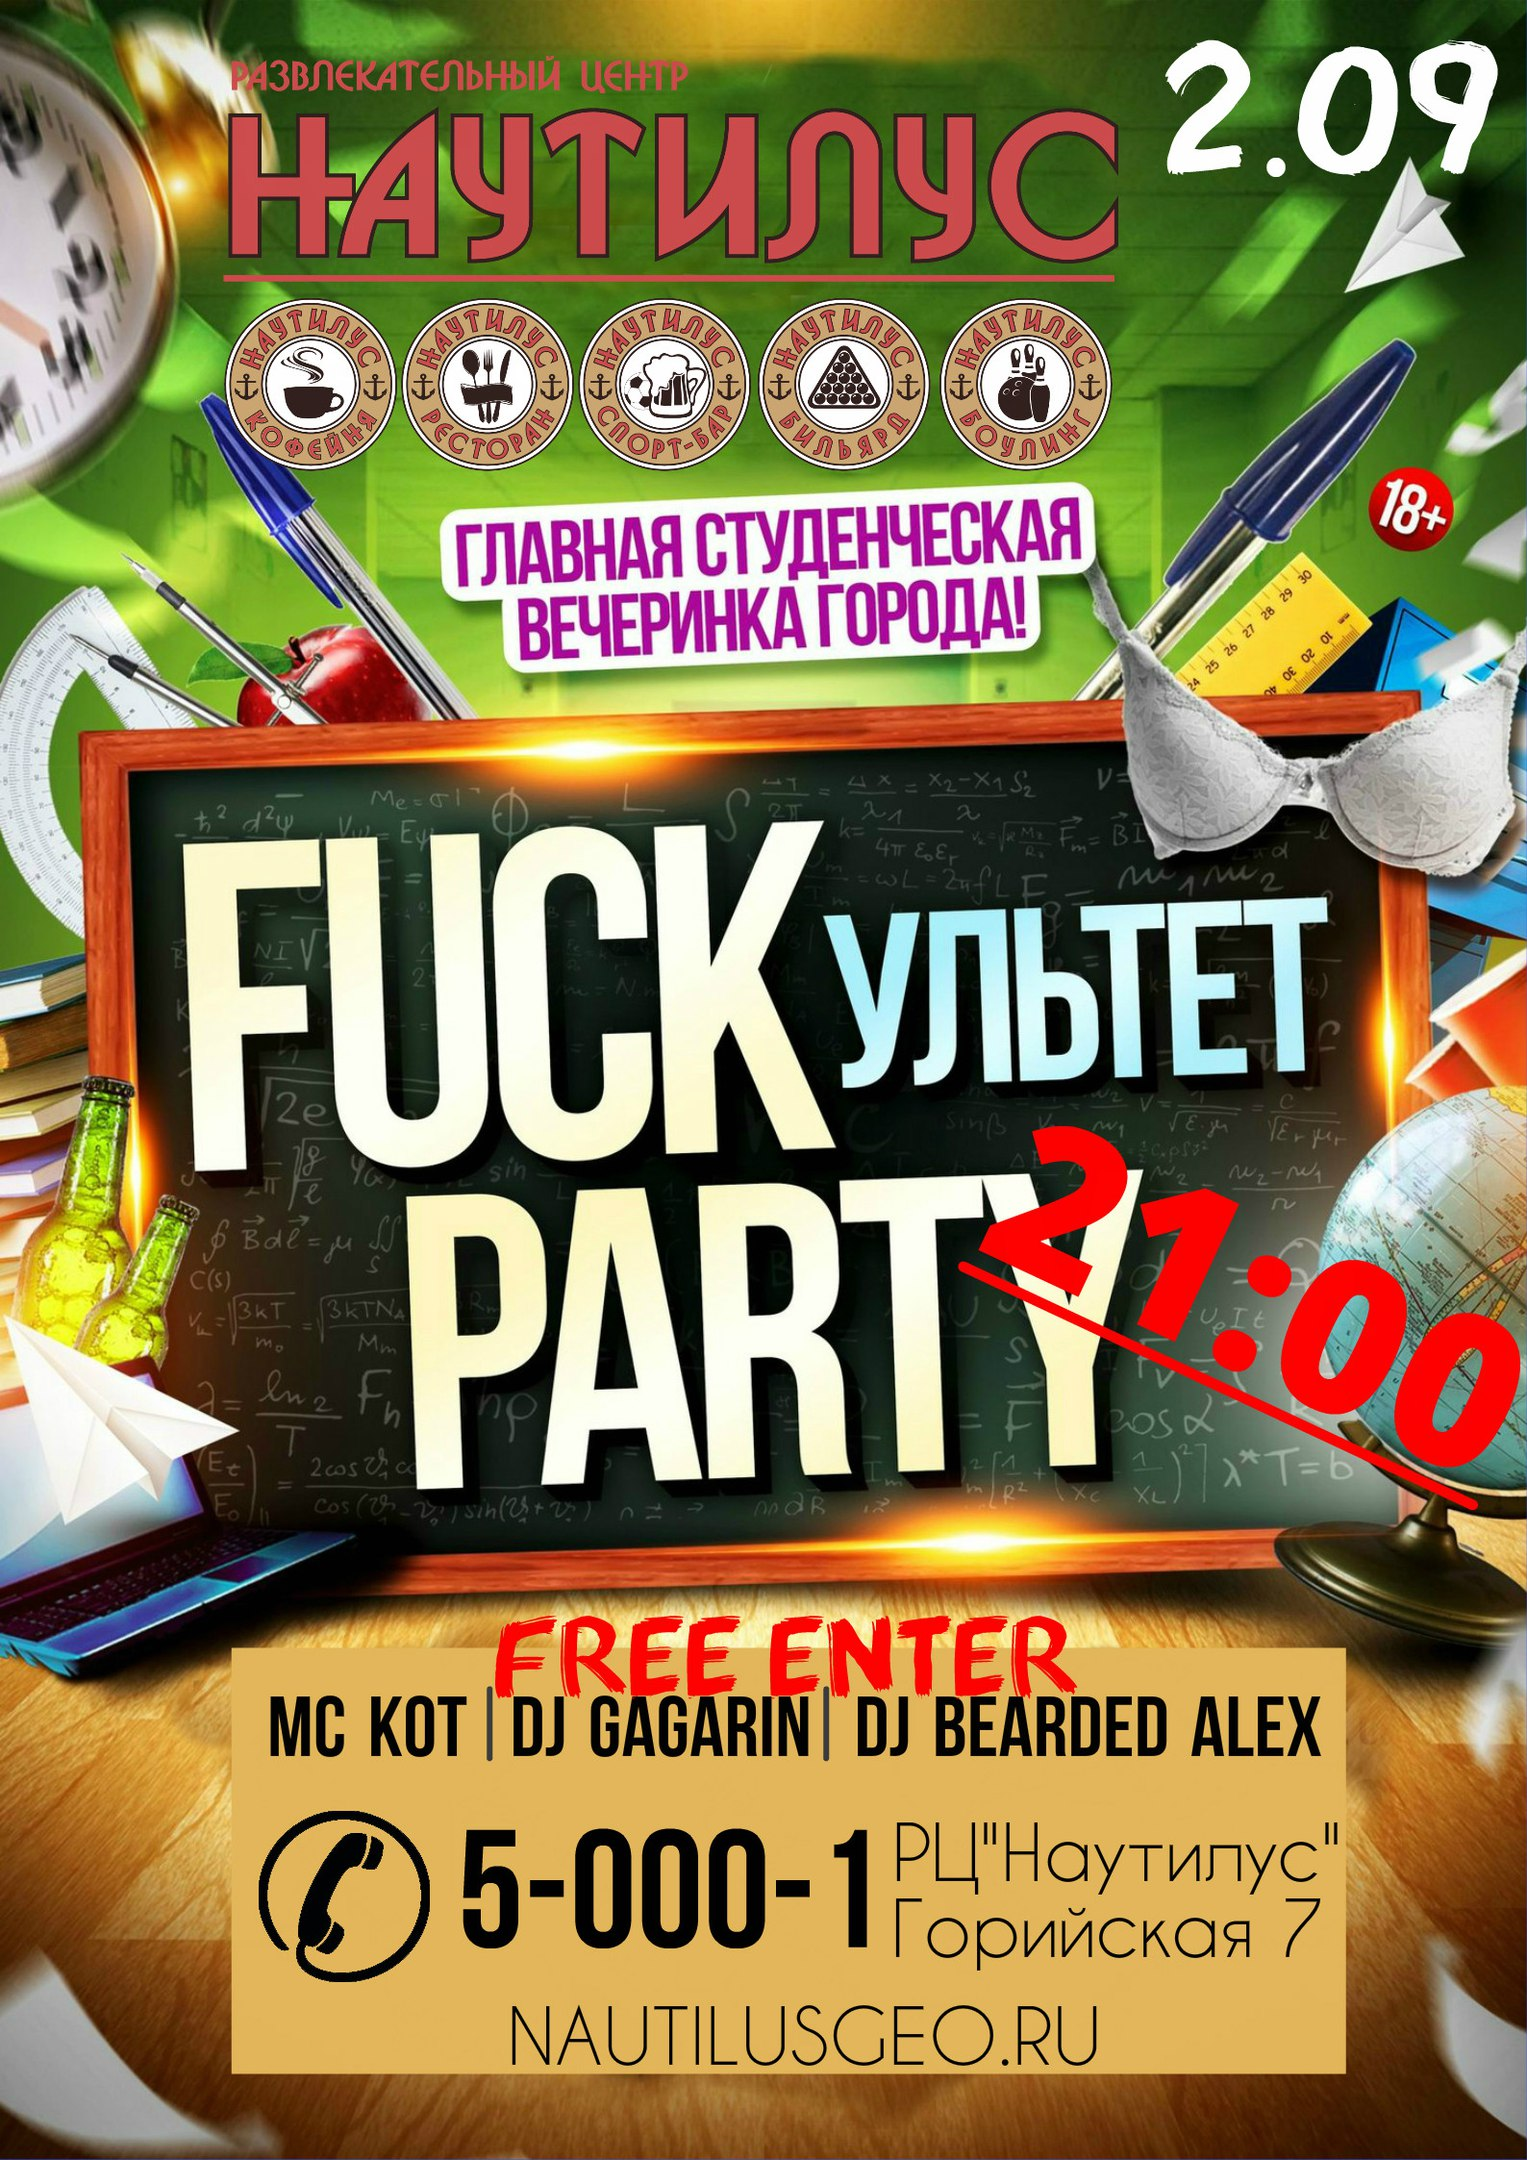 Факультет Party